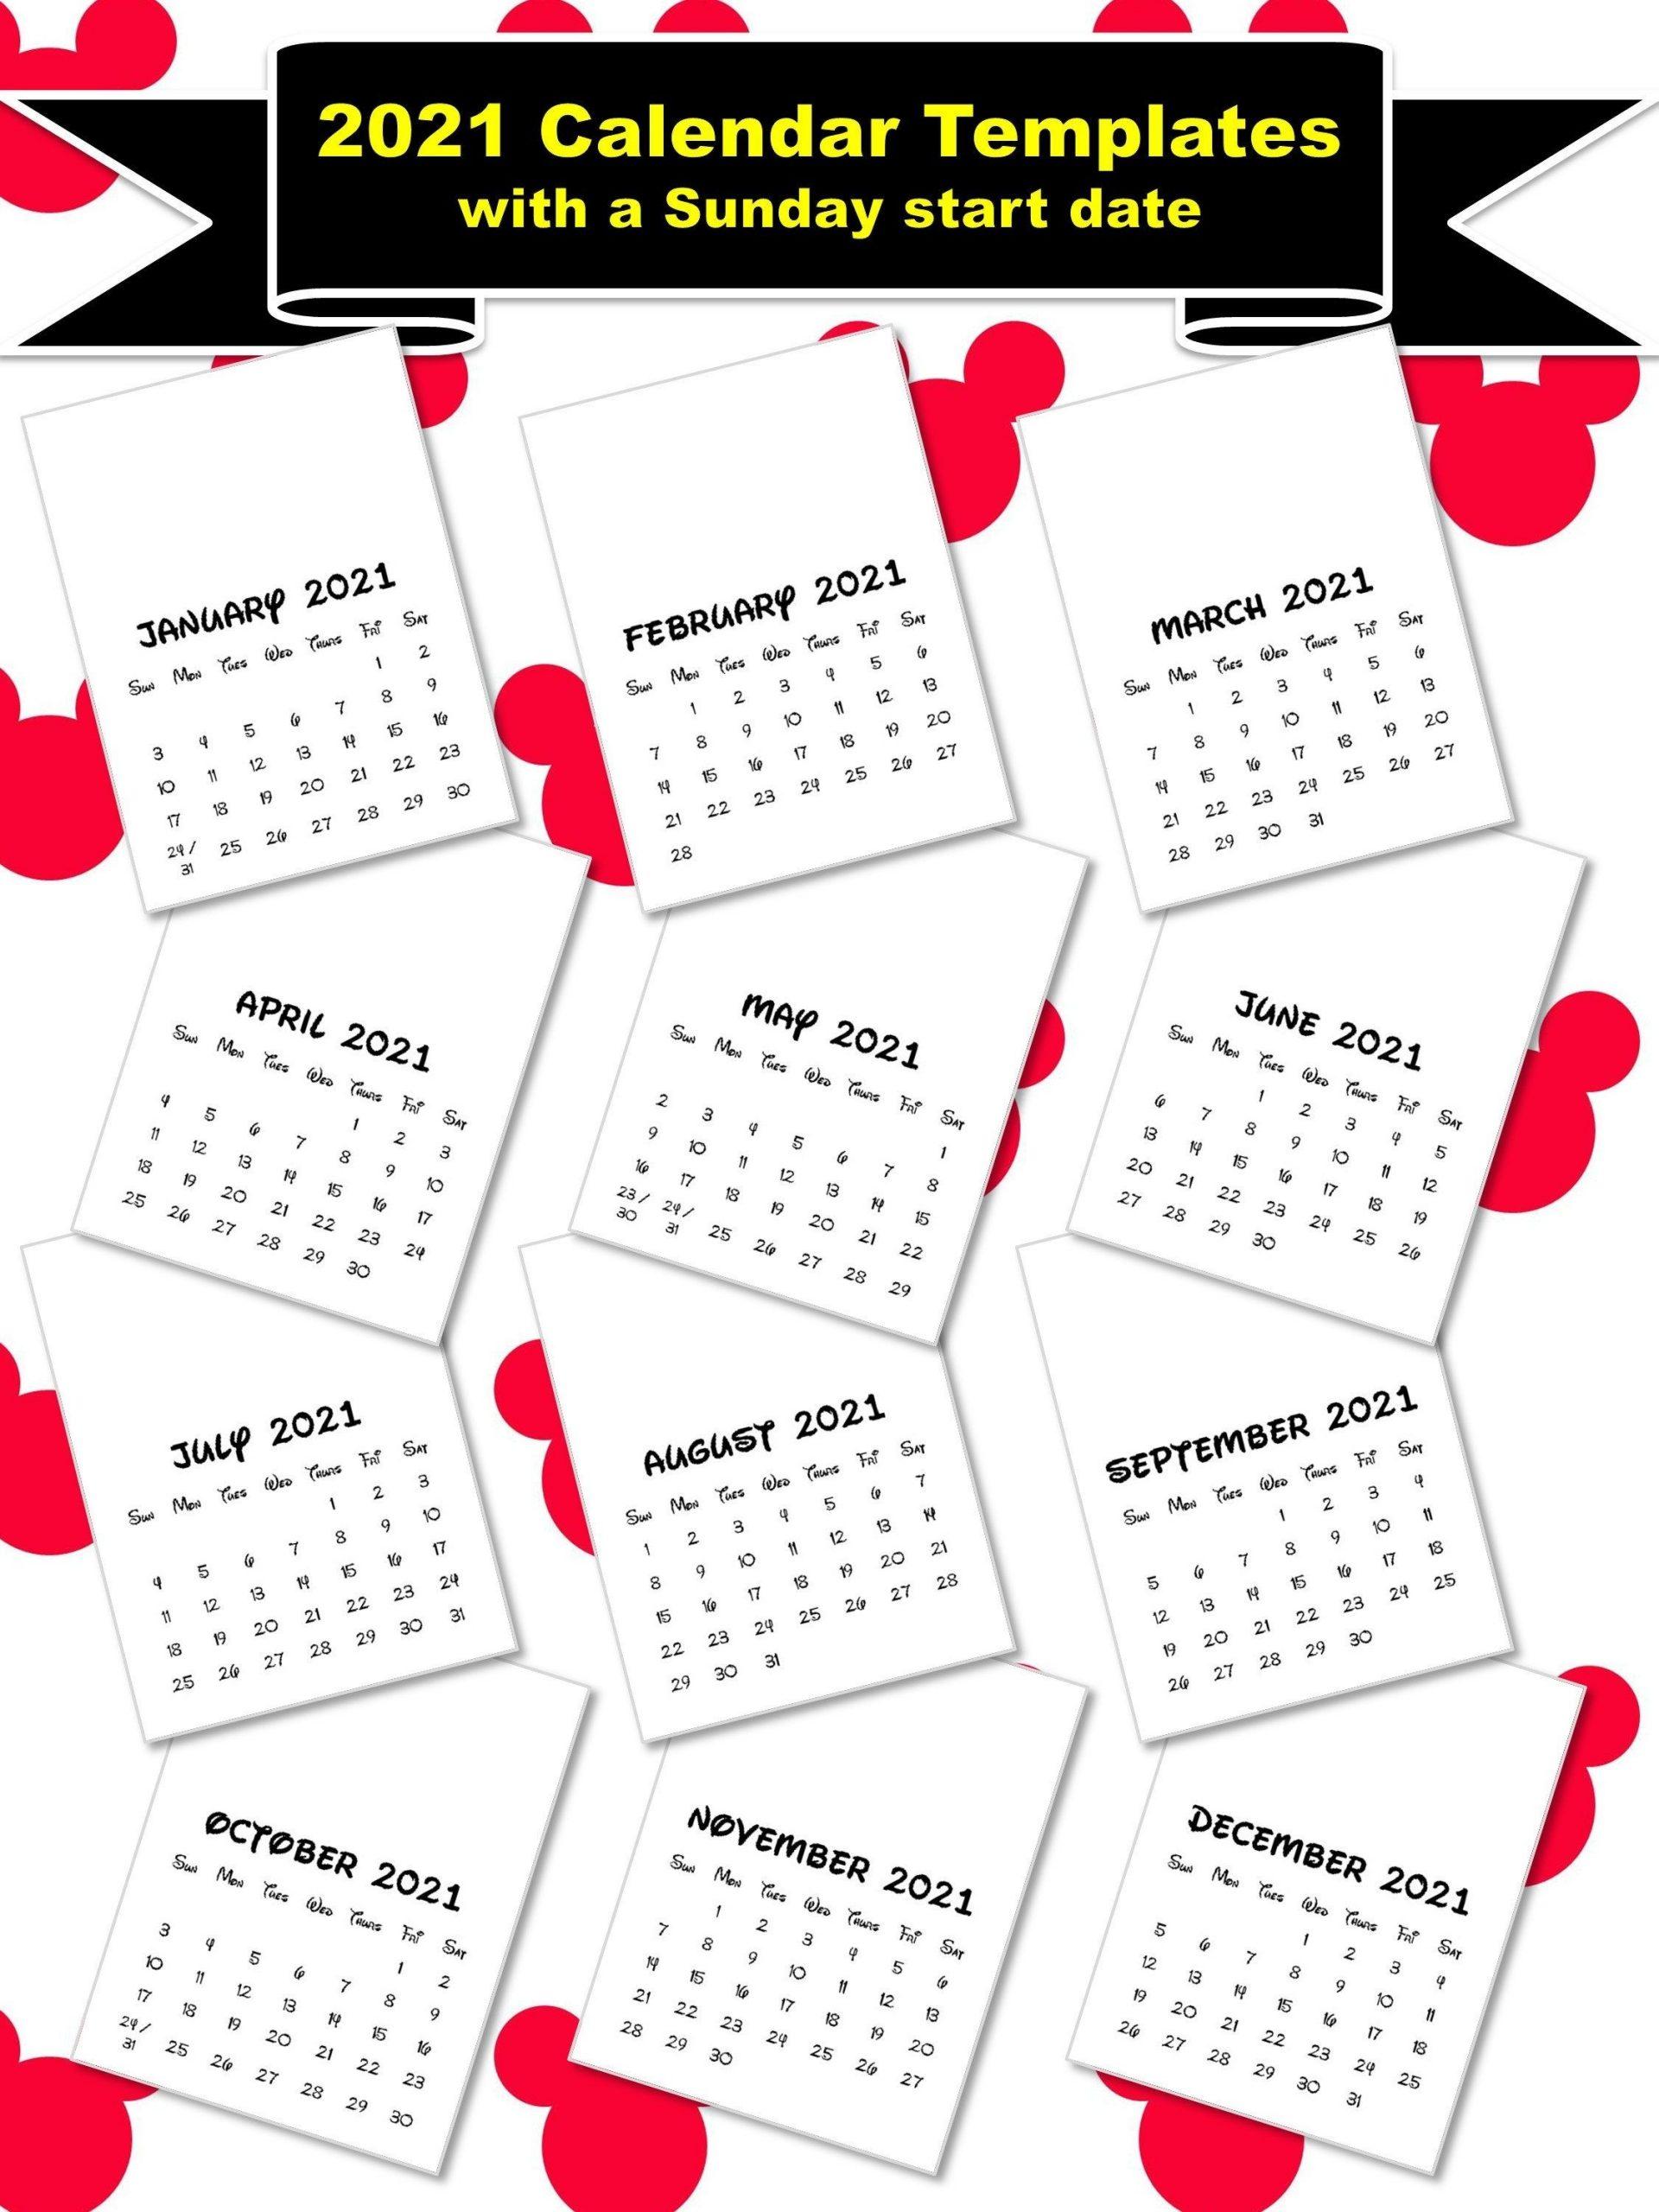 2021 Calendar Templates With A Sunday Start 8X11 | Etsy